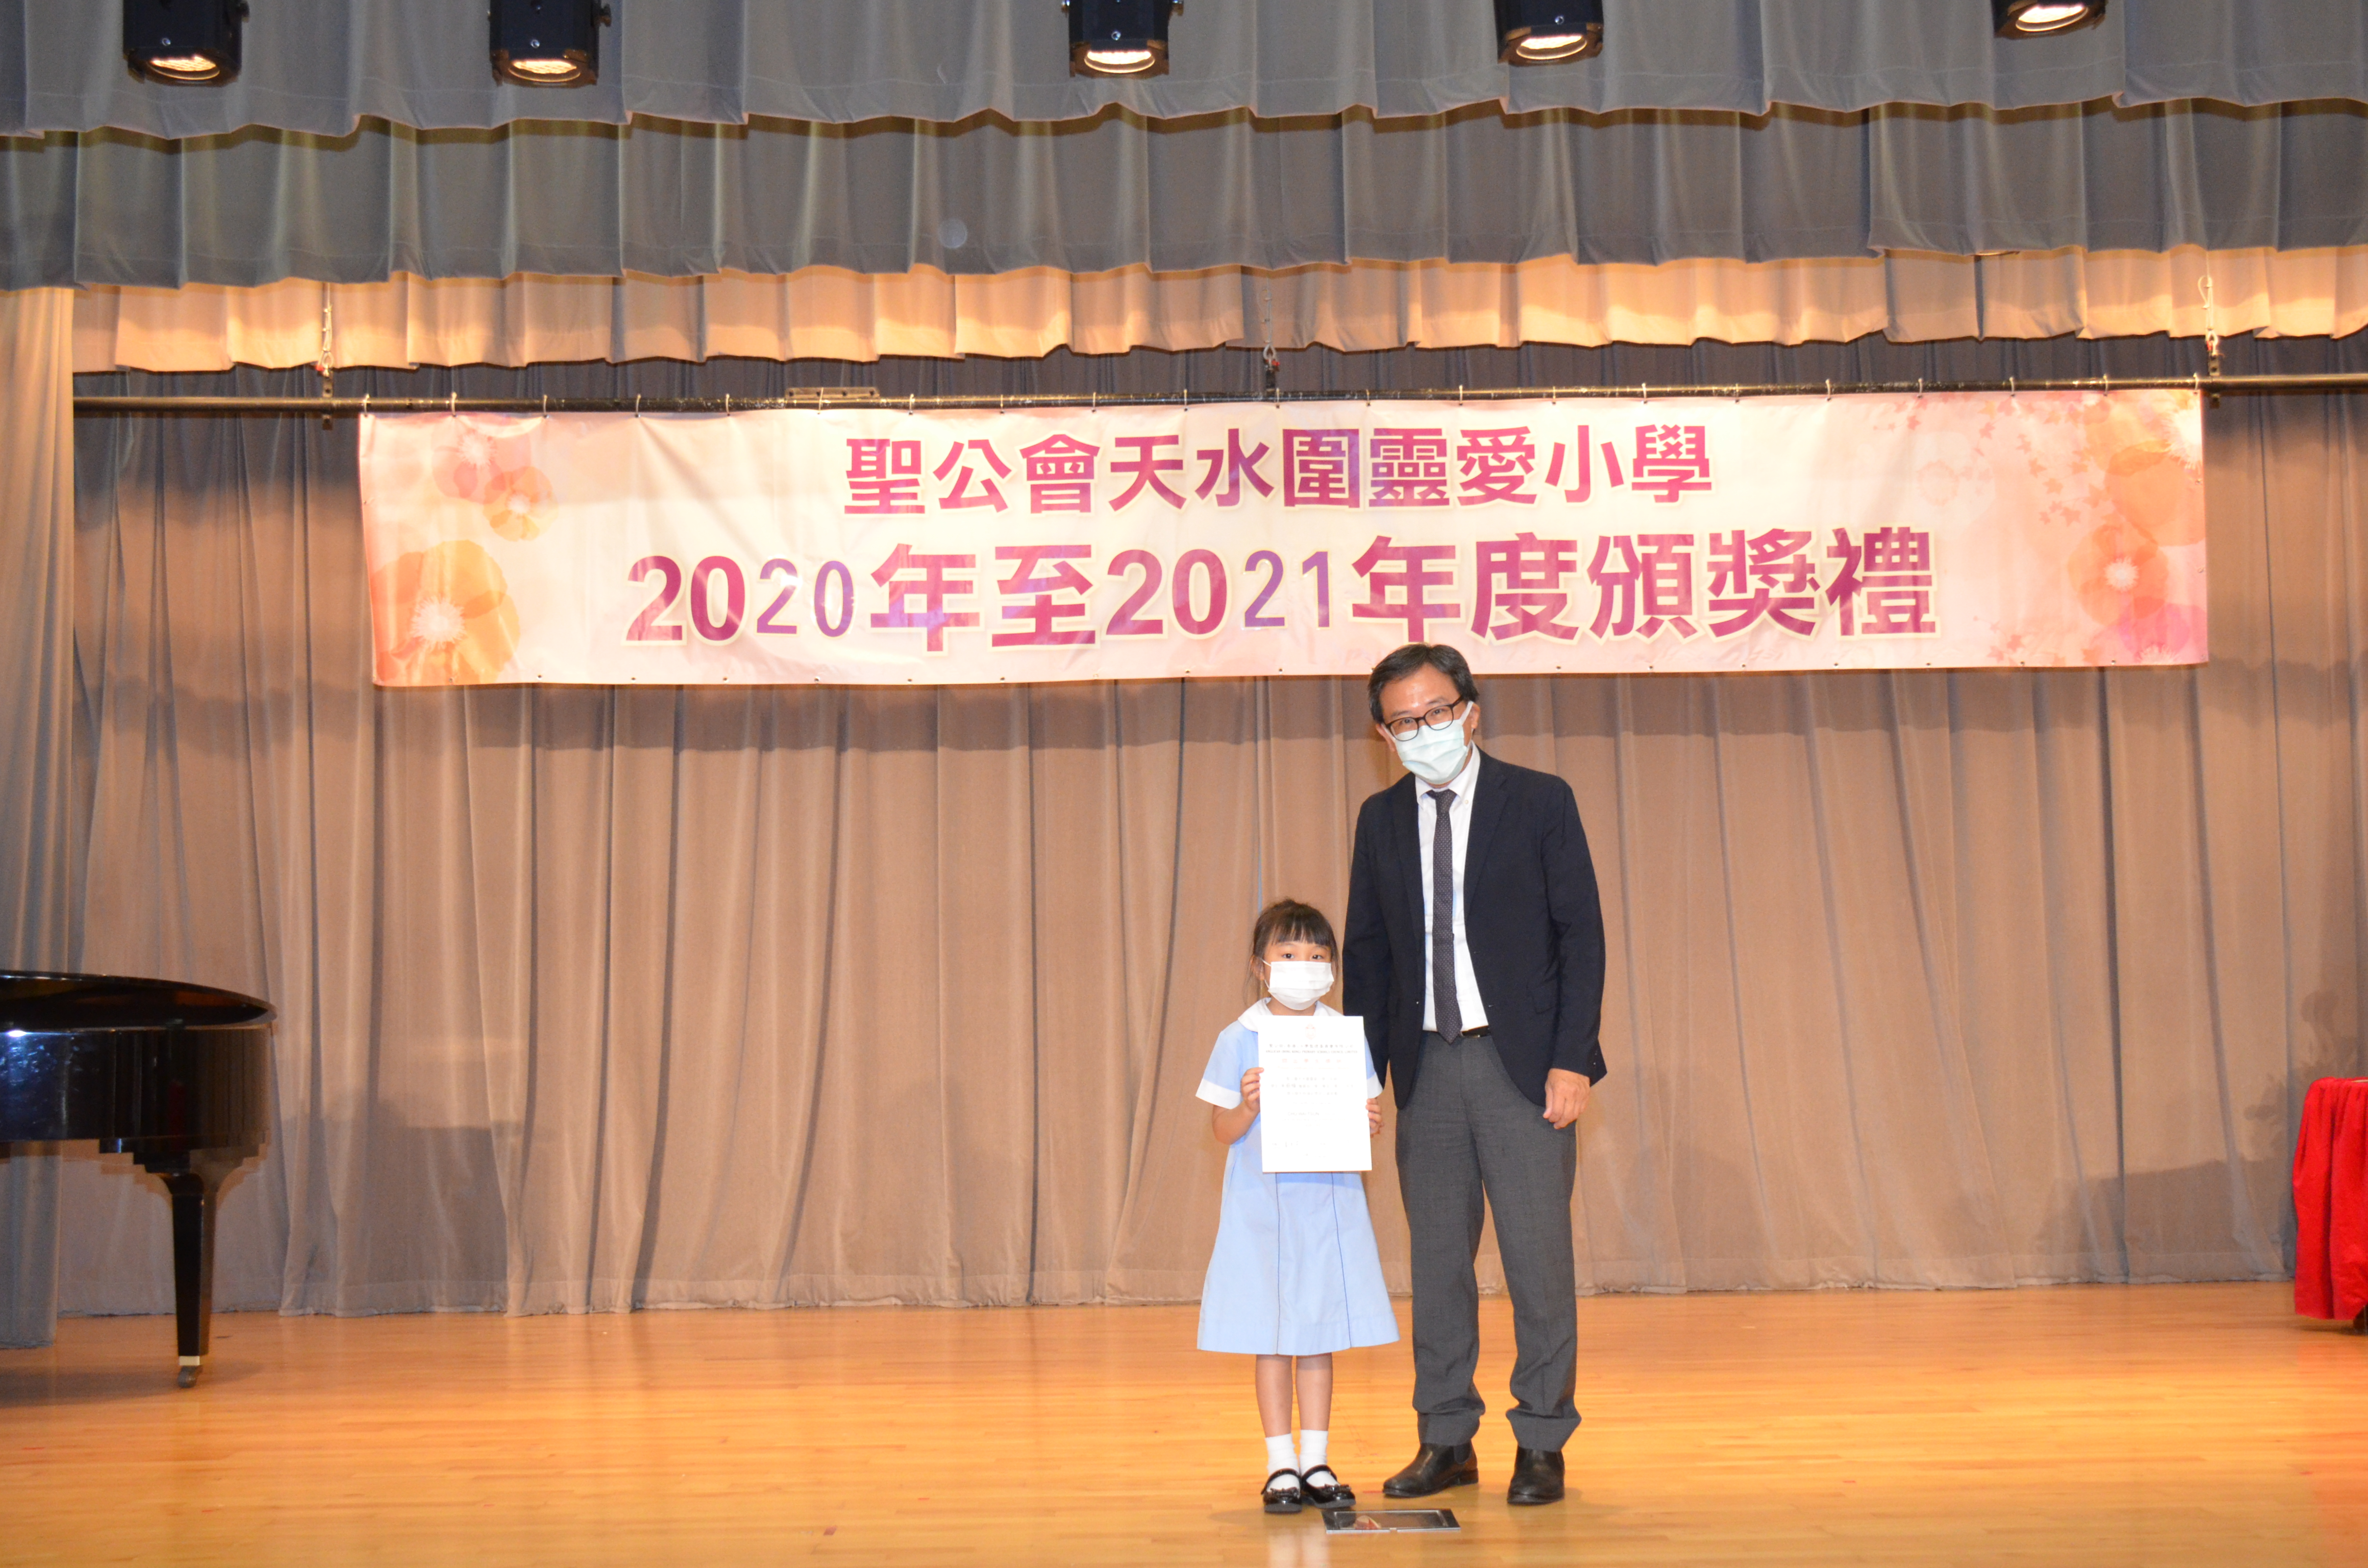 https://skhtswlo.edu.hk/sites/default/files/dsc_3450.jpg